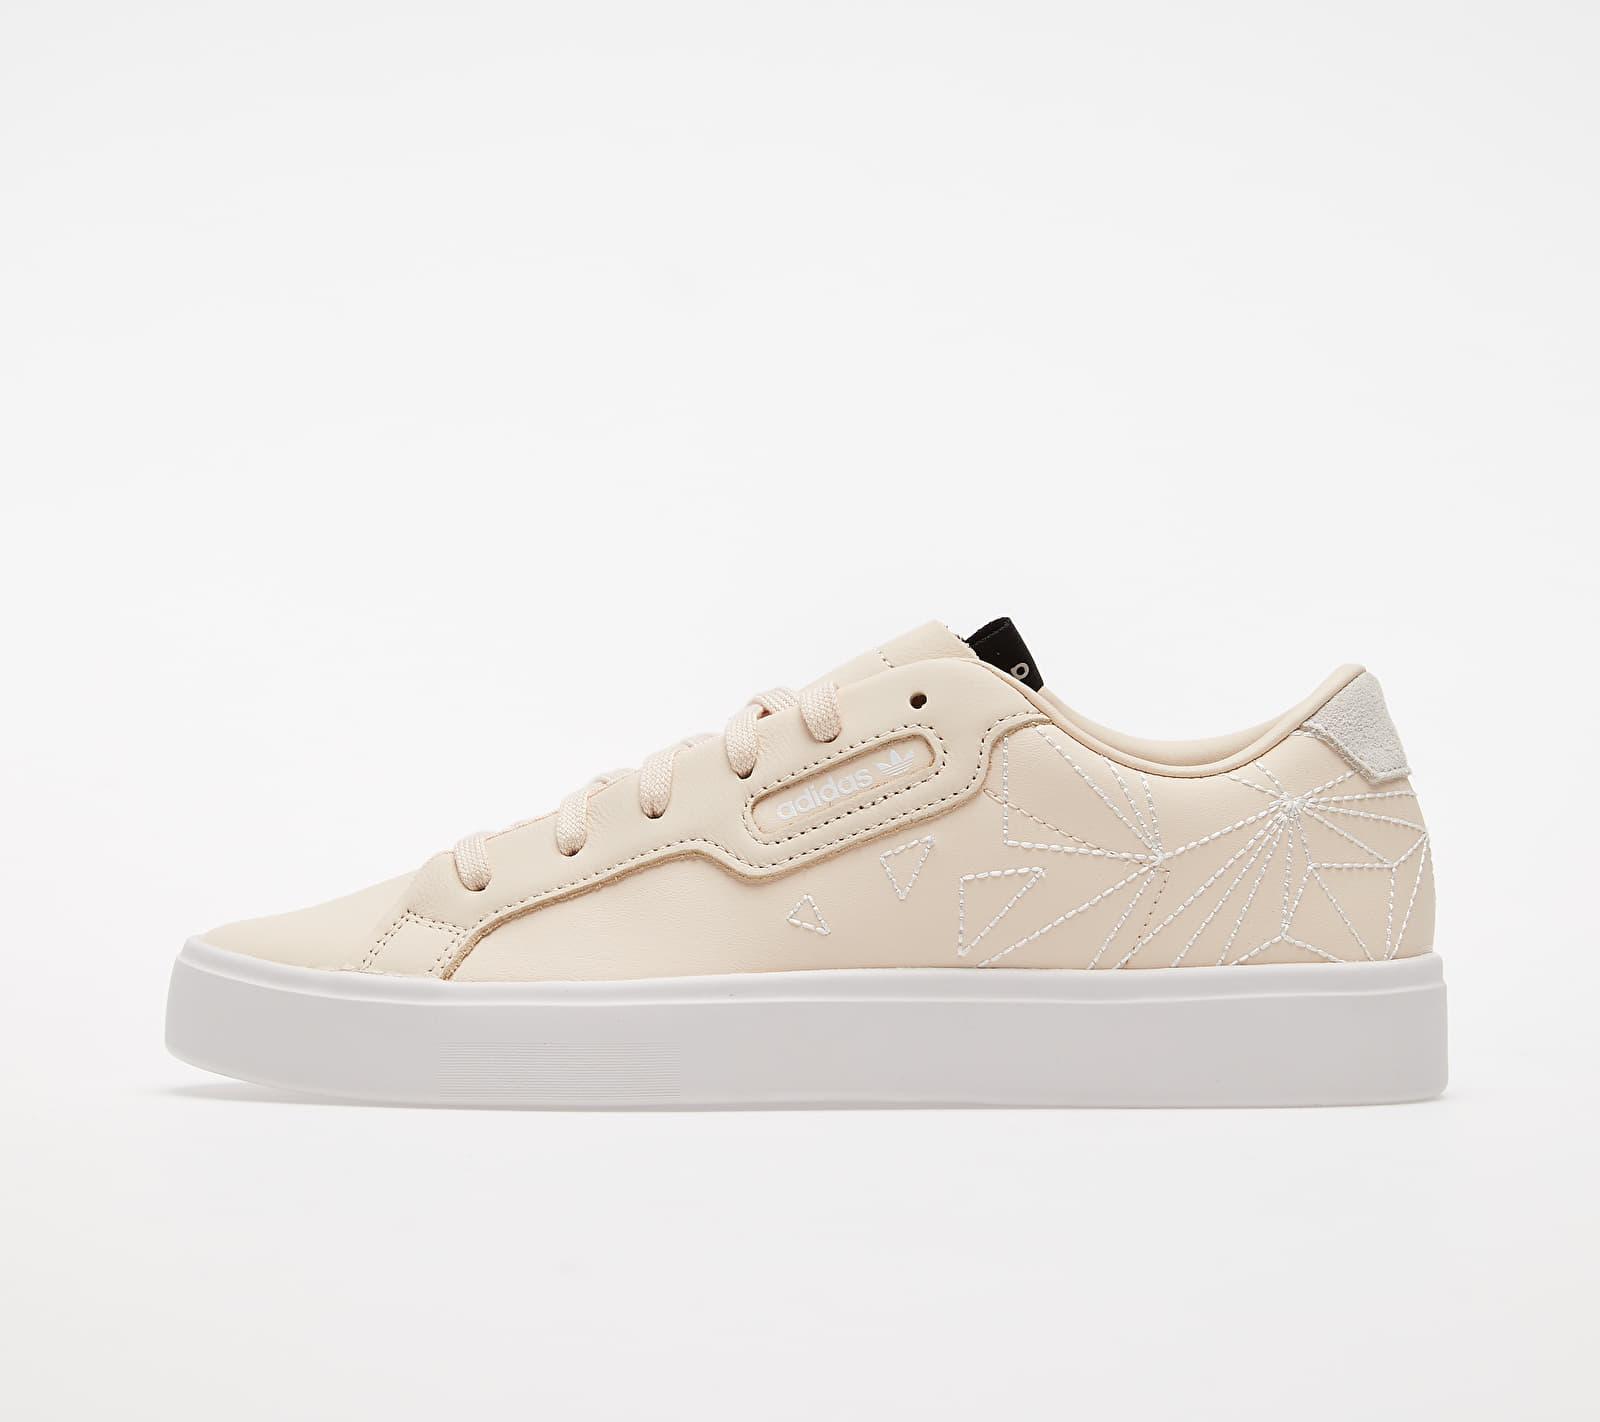 adidas Magmur Runner W Off White/ Ftw White/ Core Brown 19